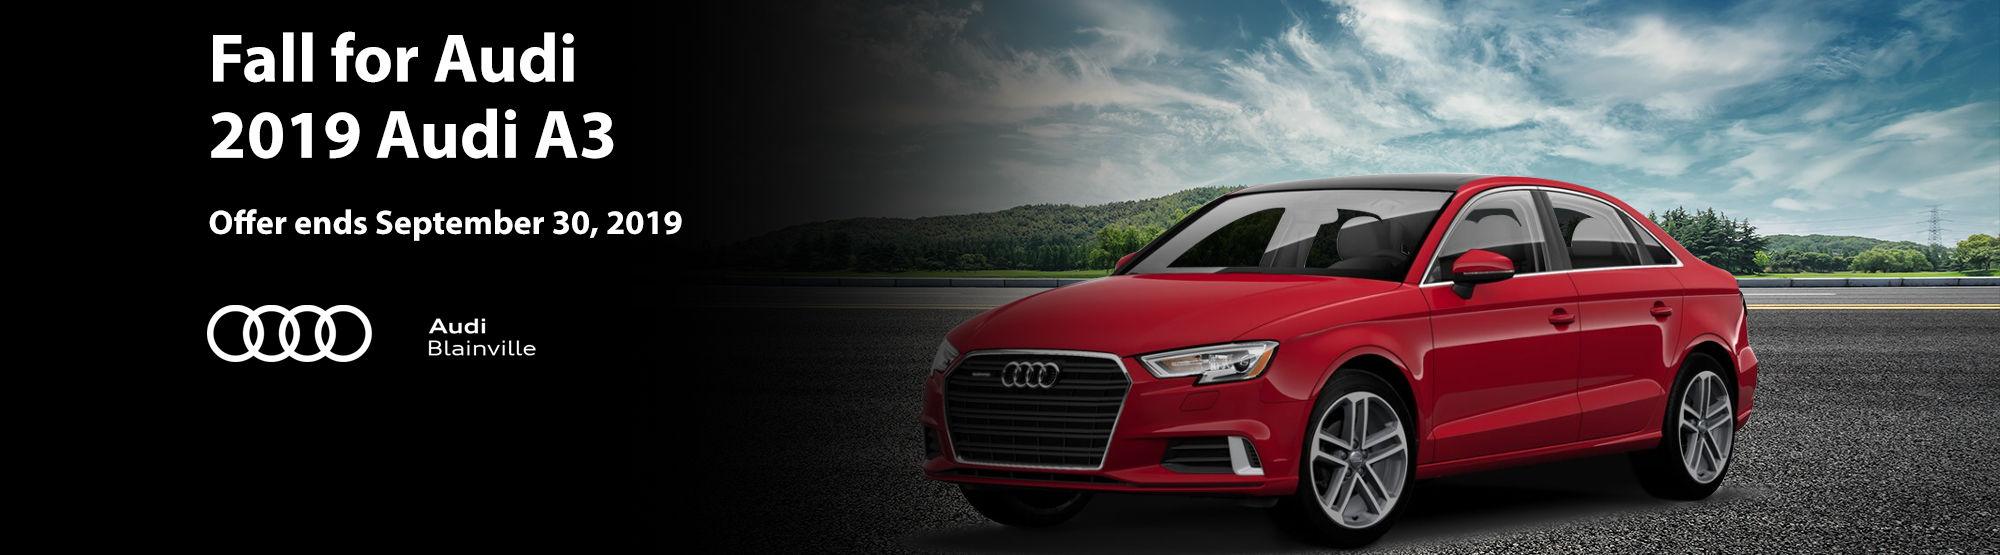 Audi A3 September 2019